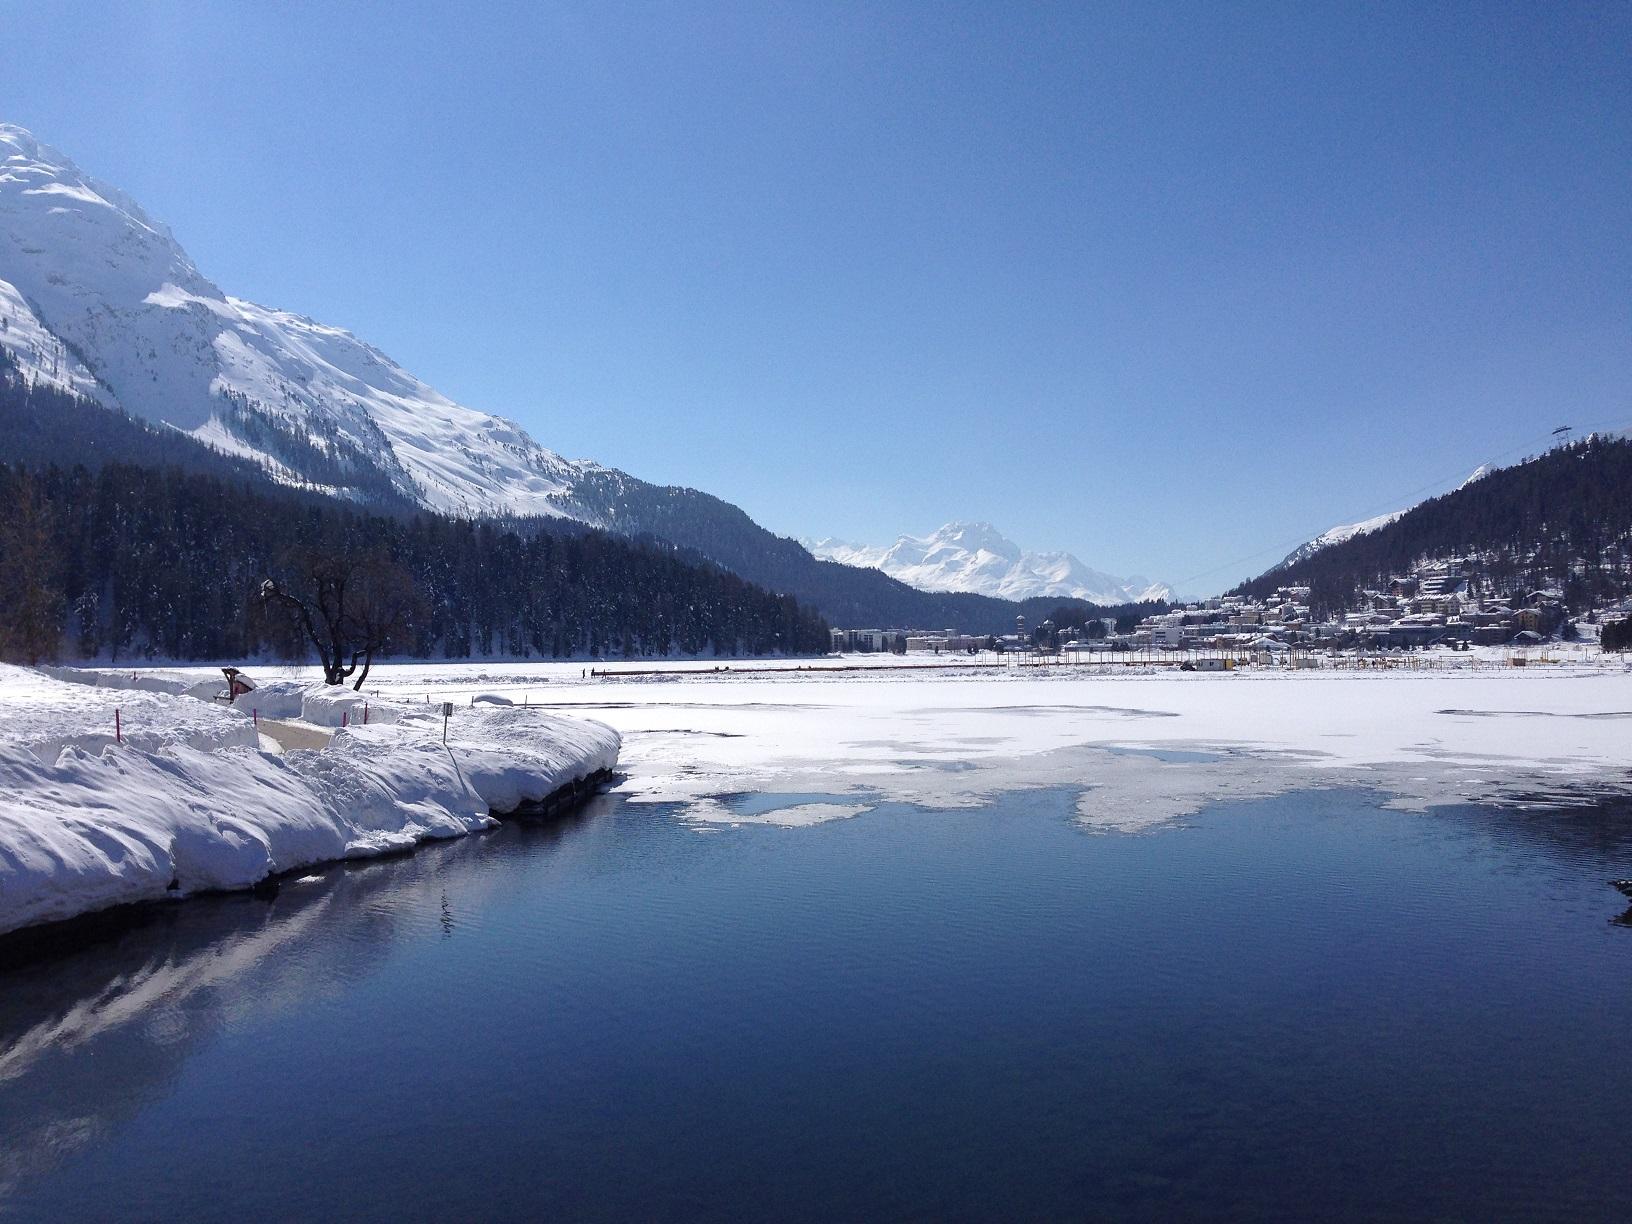 St. Moritz Winter Lake